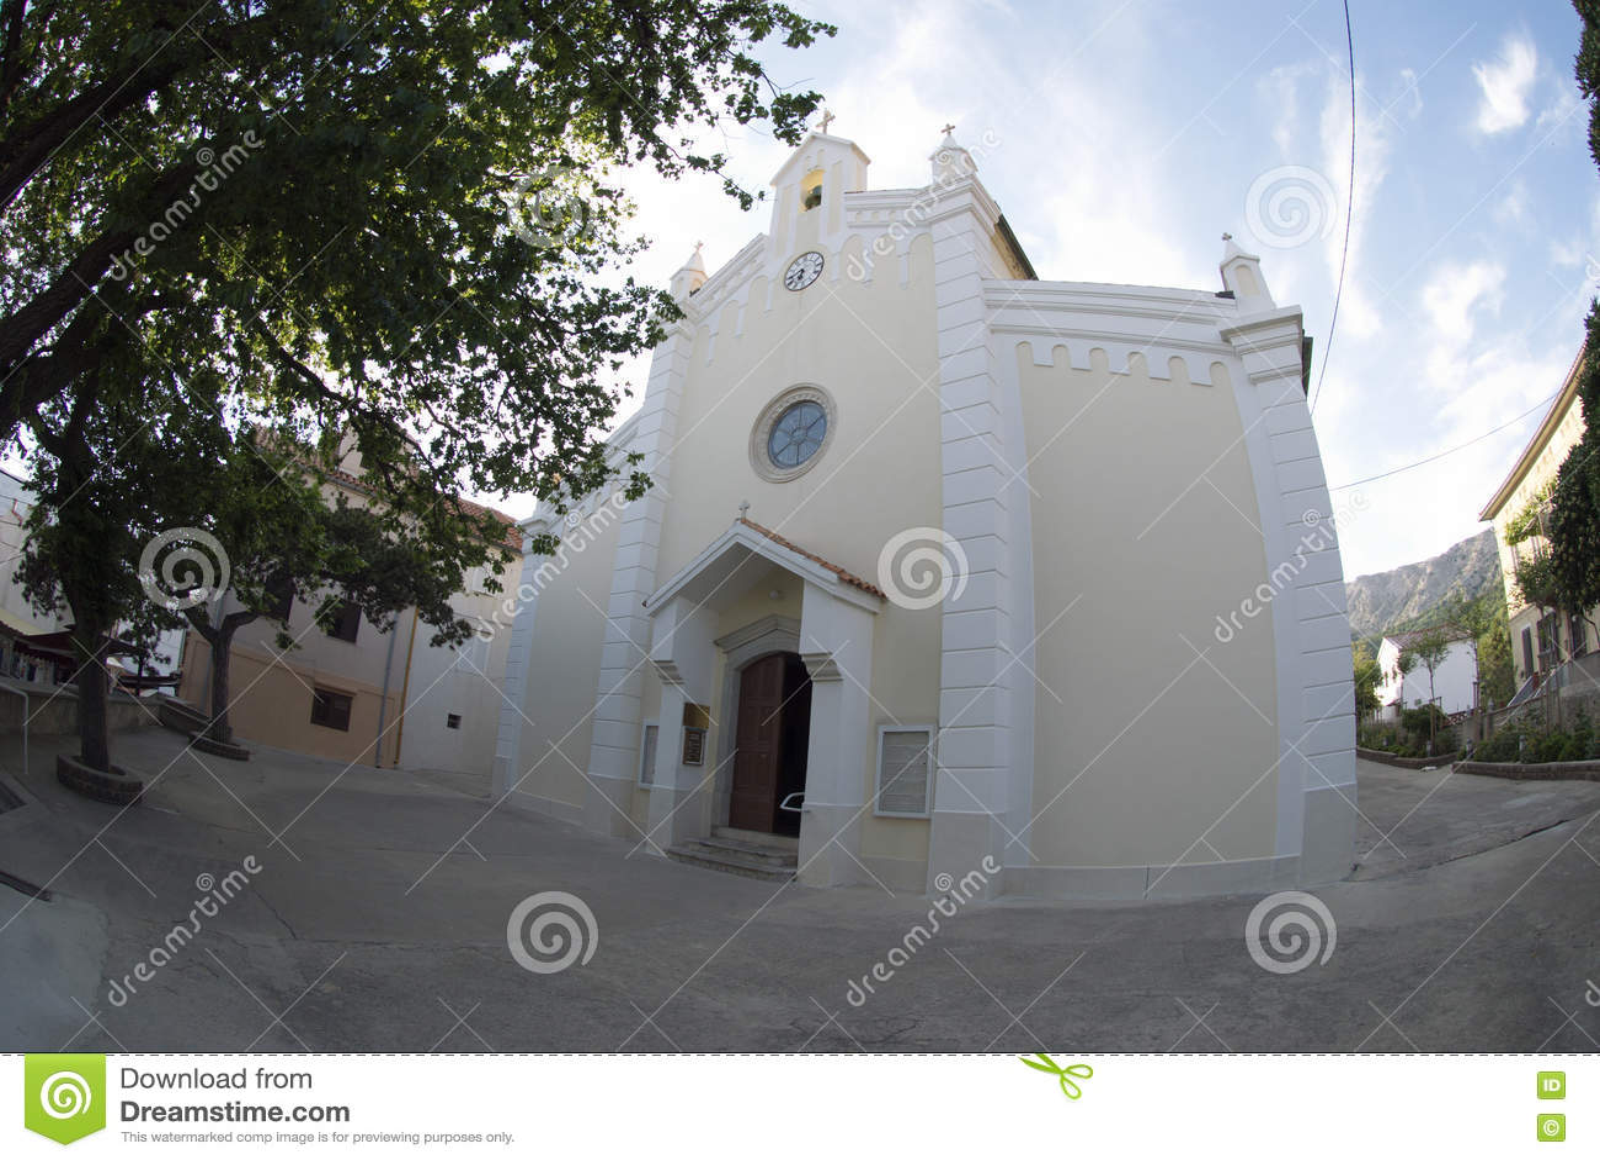 The parish church of St. Trinity and old tree in Baska on island Krk,Croatia